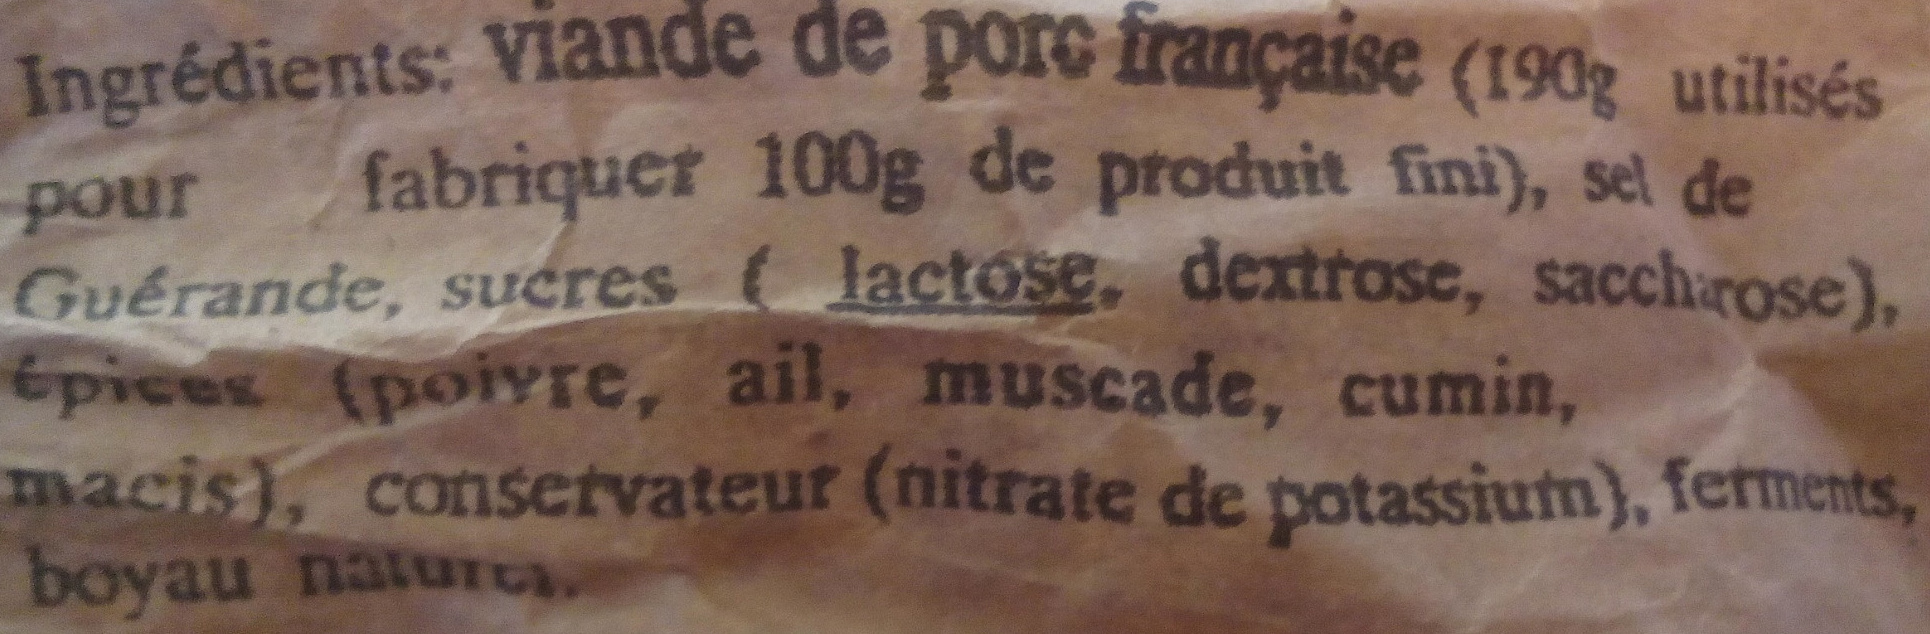 Saucisson sec de campagne pur porc - Ingrediënten - fr